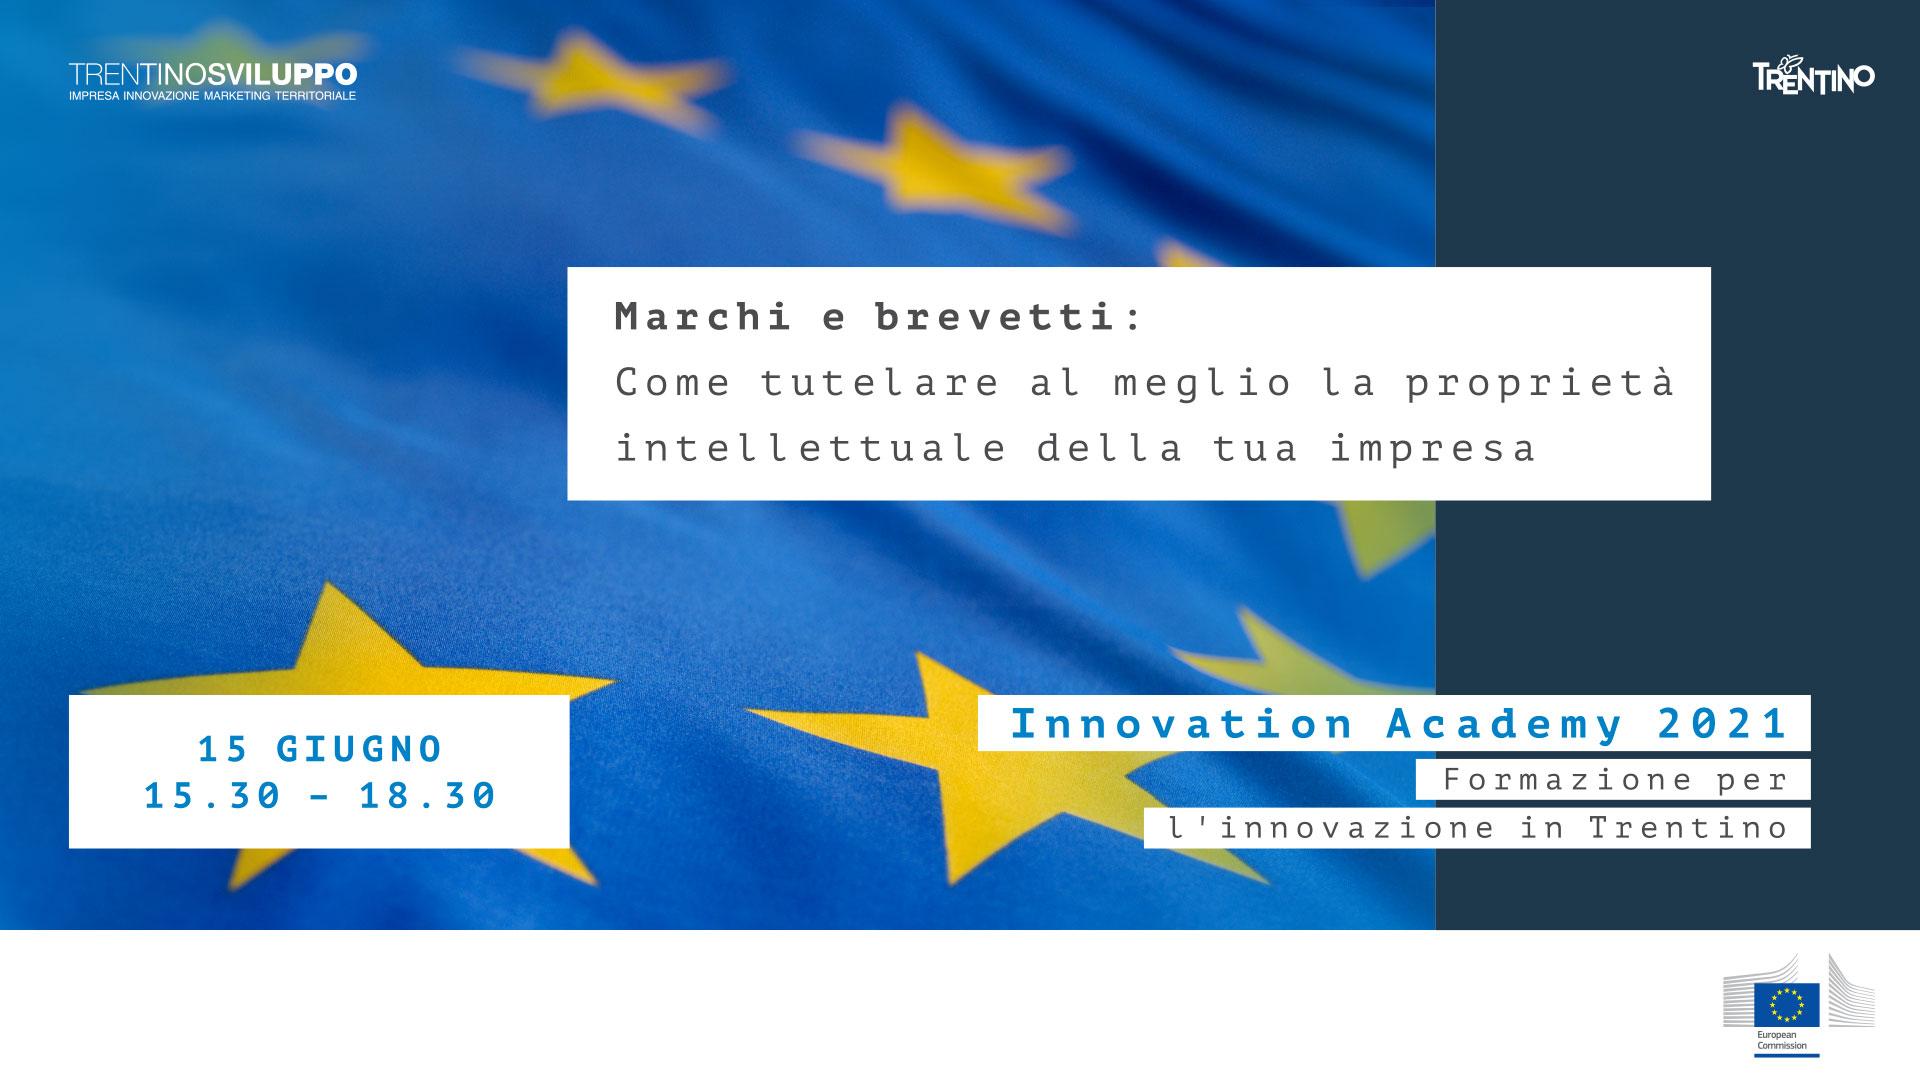 Banner-Innovation-Marchi-e-brevetti-1920x1080